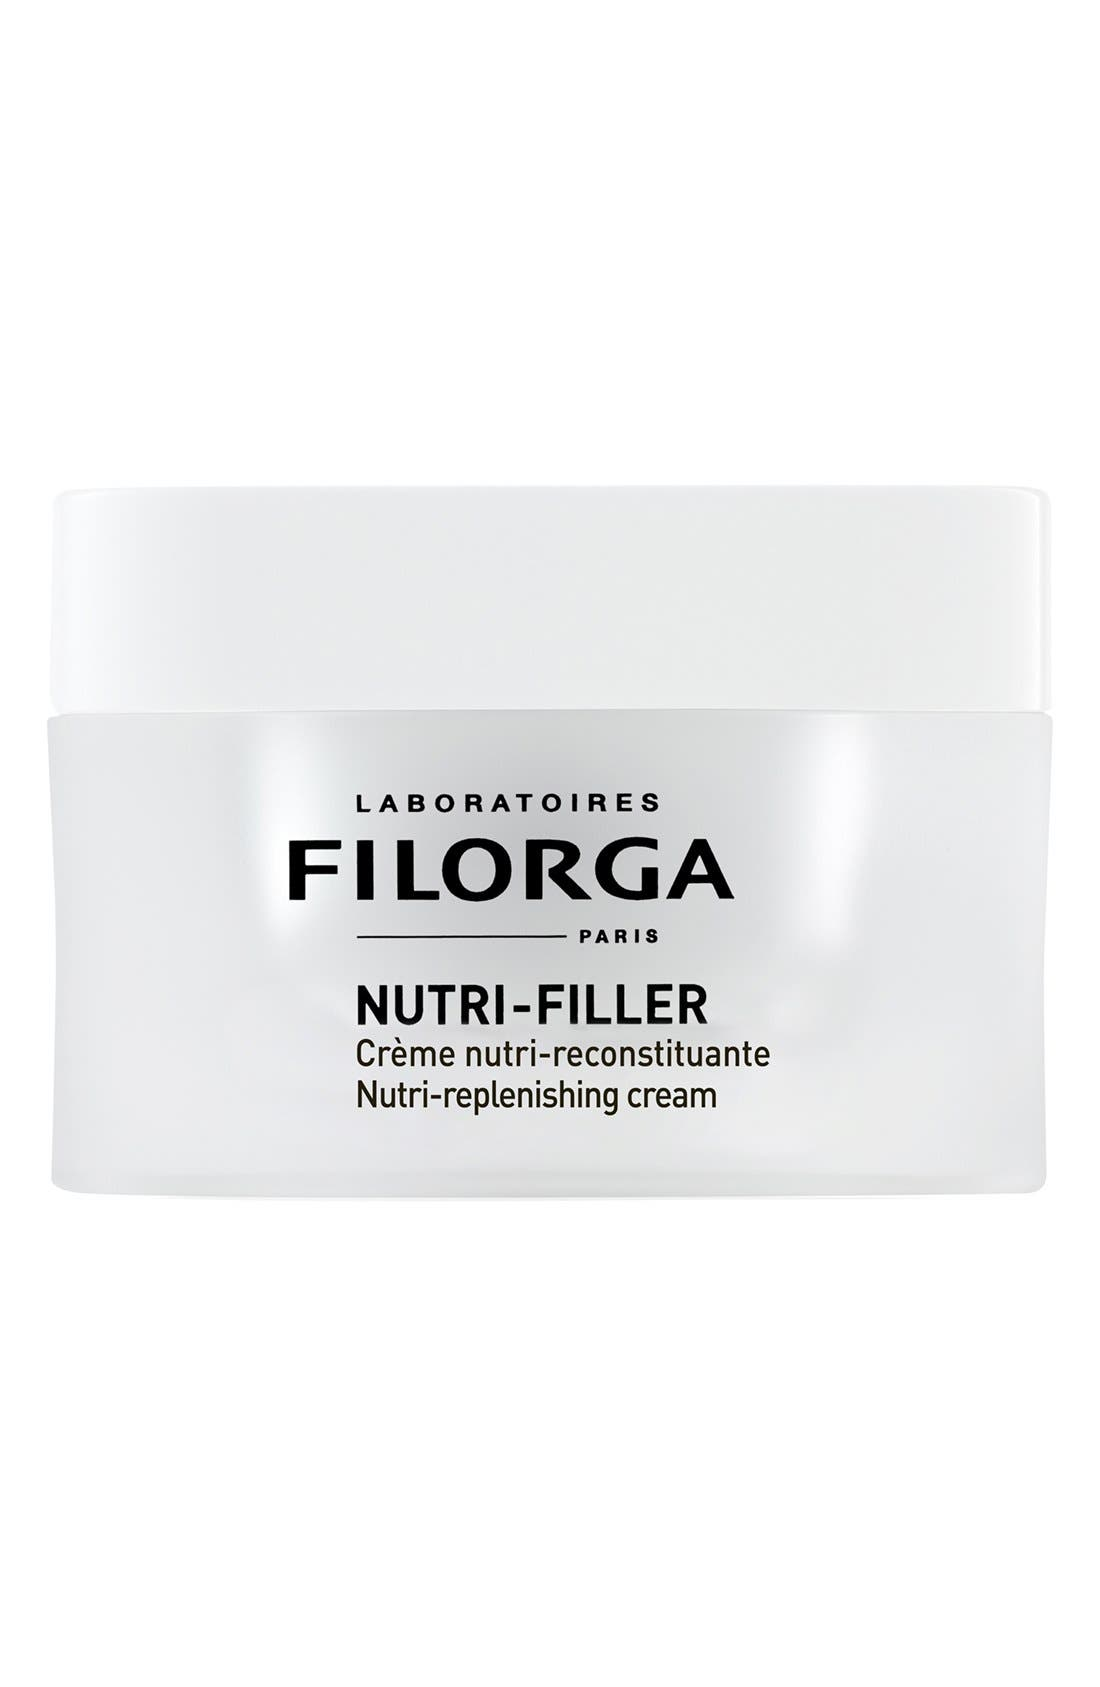 Filorga 'Nutri-Filler®' Nutri-Replenishing Cream